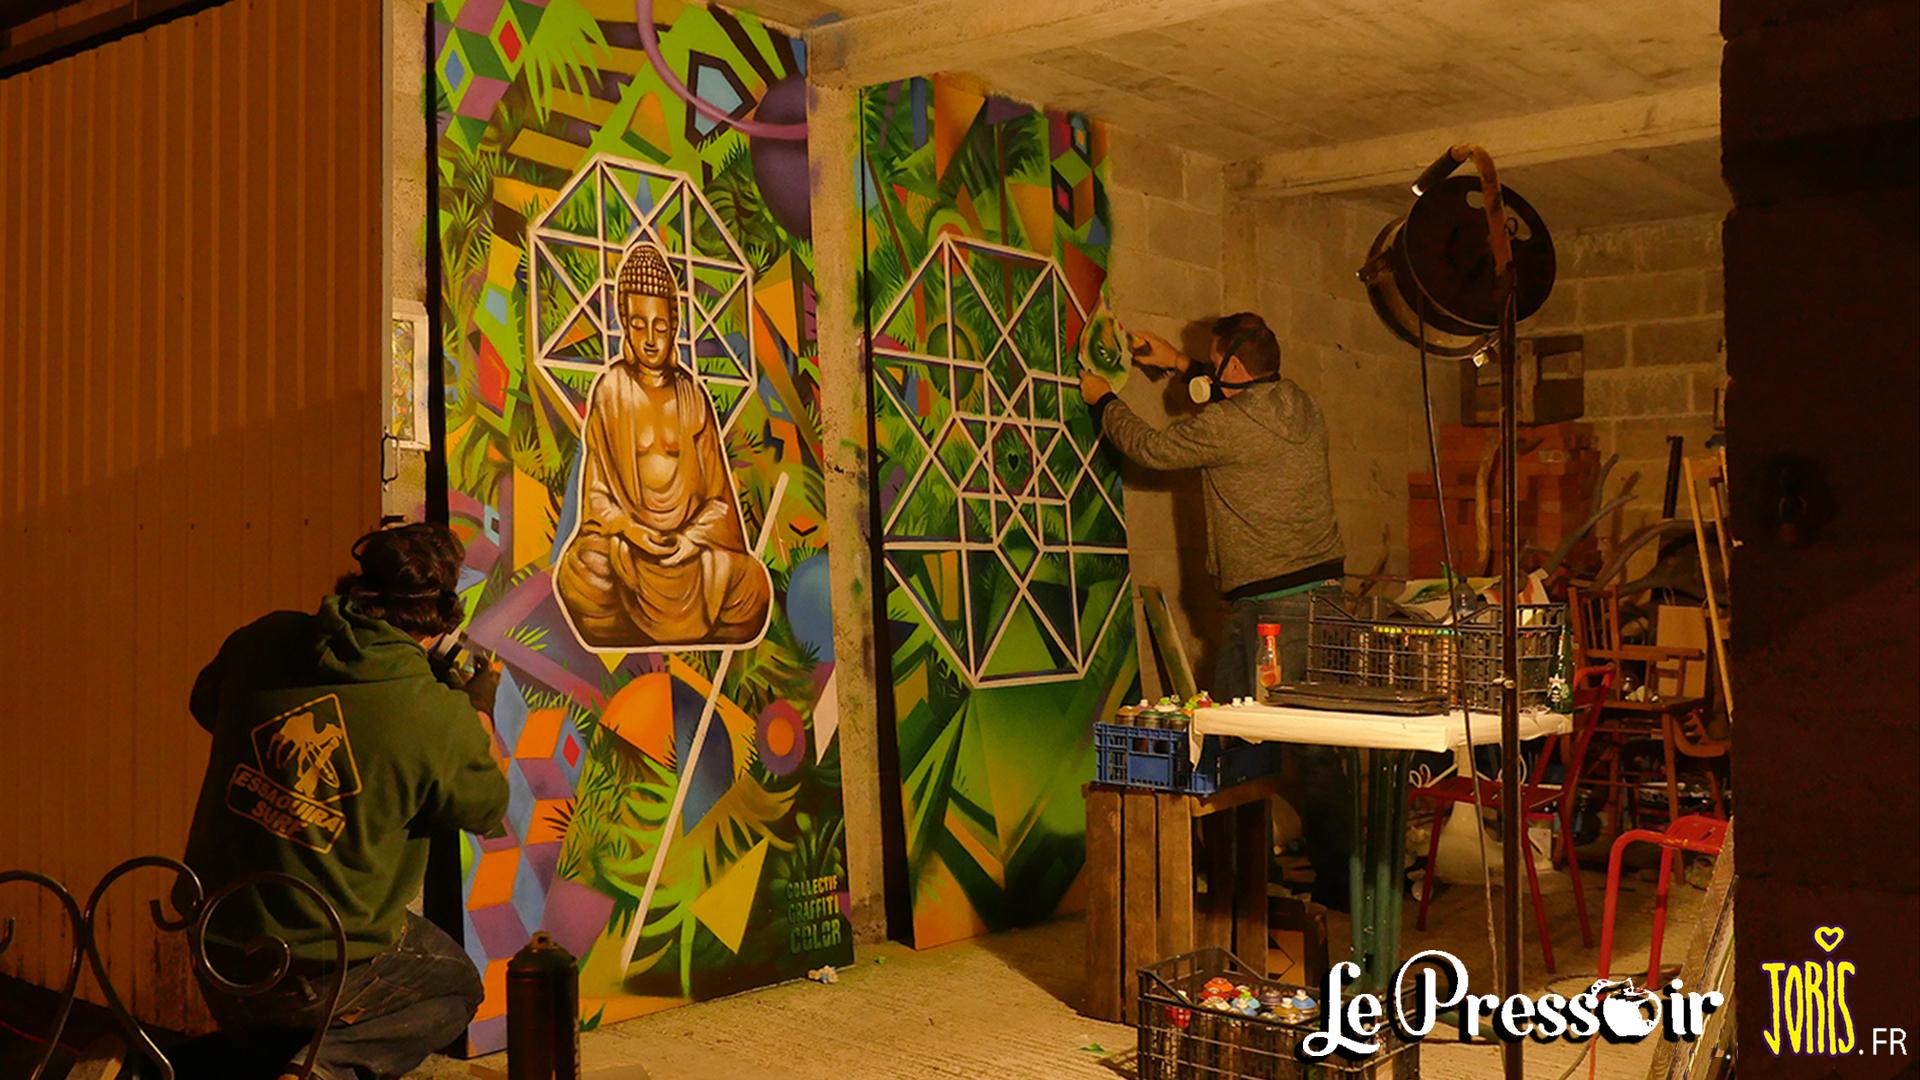 DECORATION-GRAFFITI-FRESQUE-TABLEAU-STREET-ART-PARIS-10